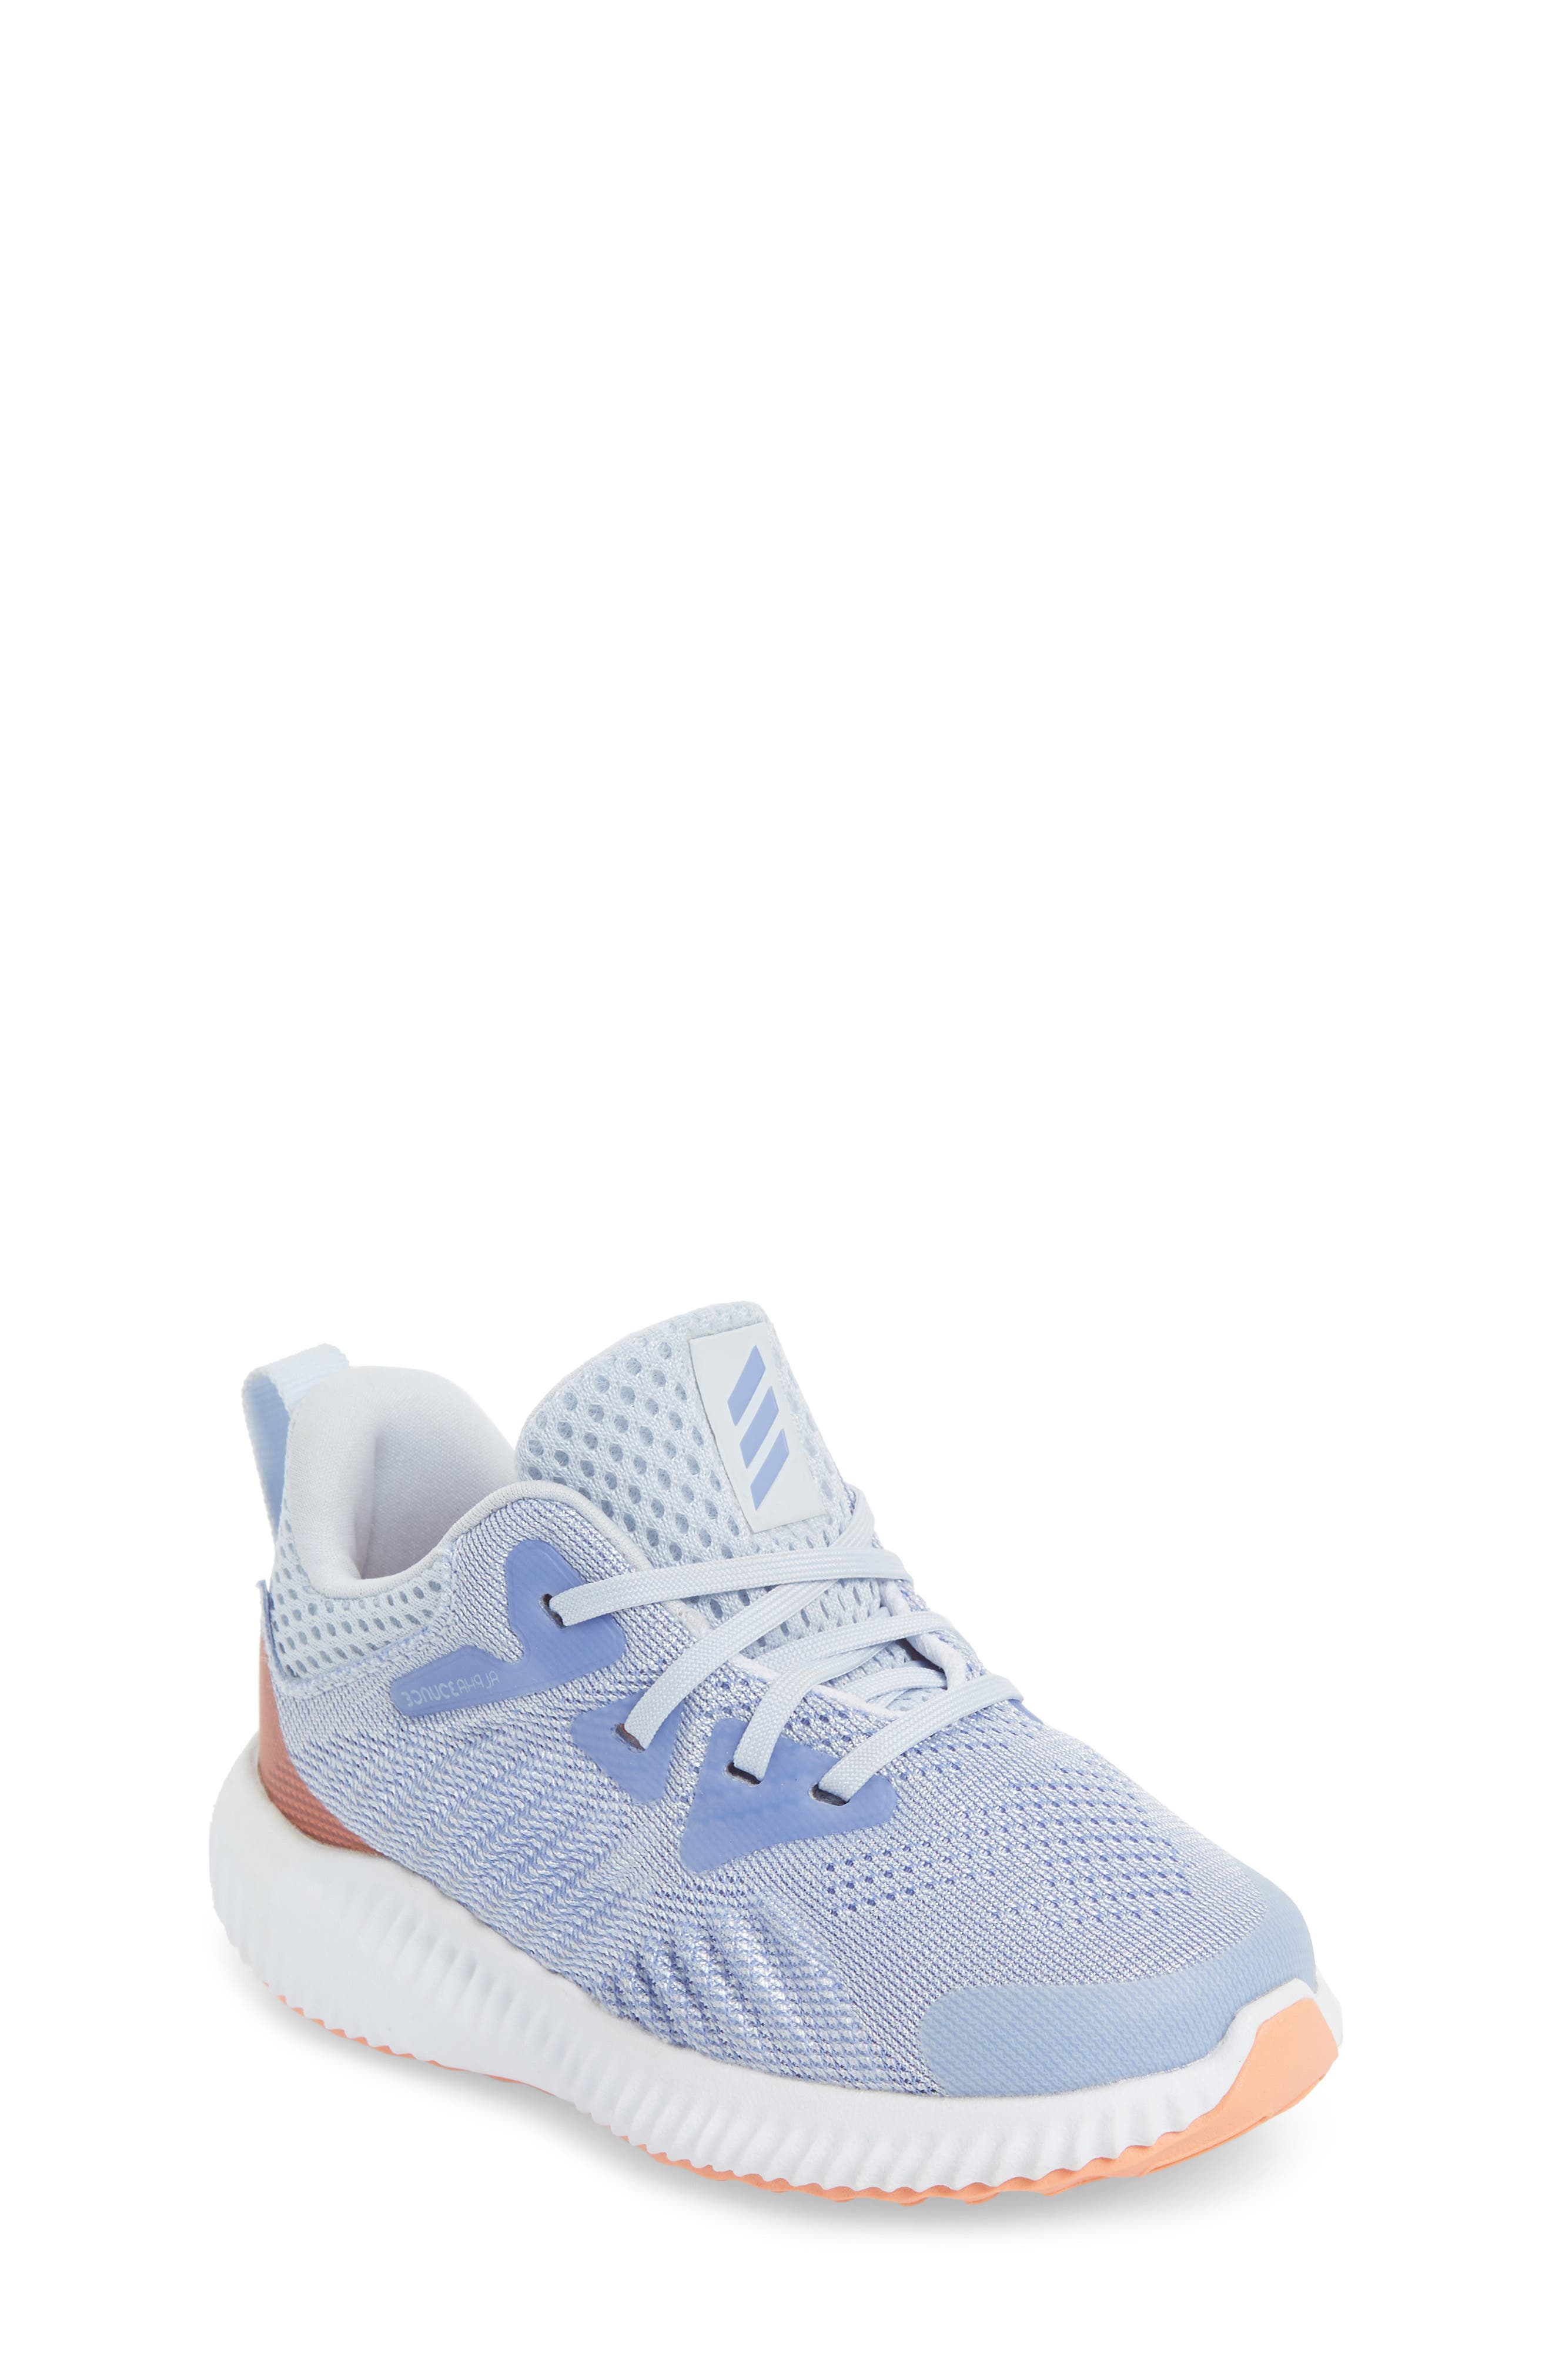 Main Image - adidas AlphaBounce Beyond Running Shoe (Baby, Walker, Toddler, Little Kid & Big Kid)